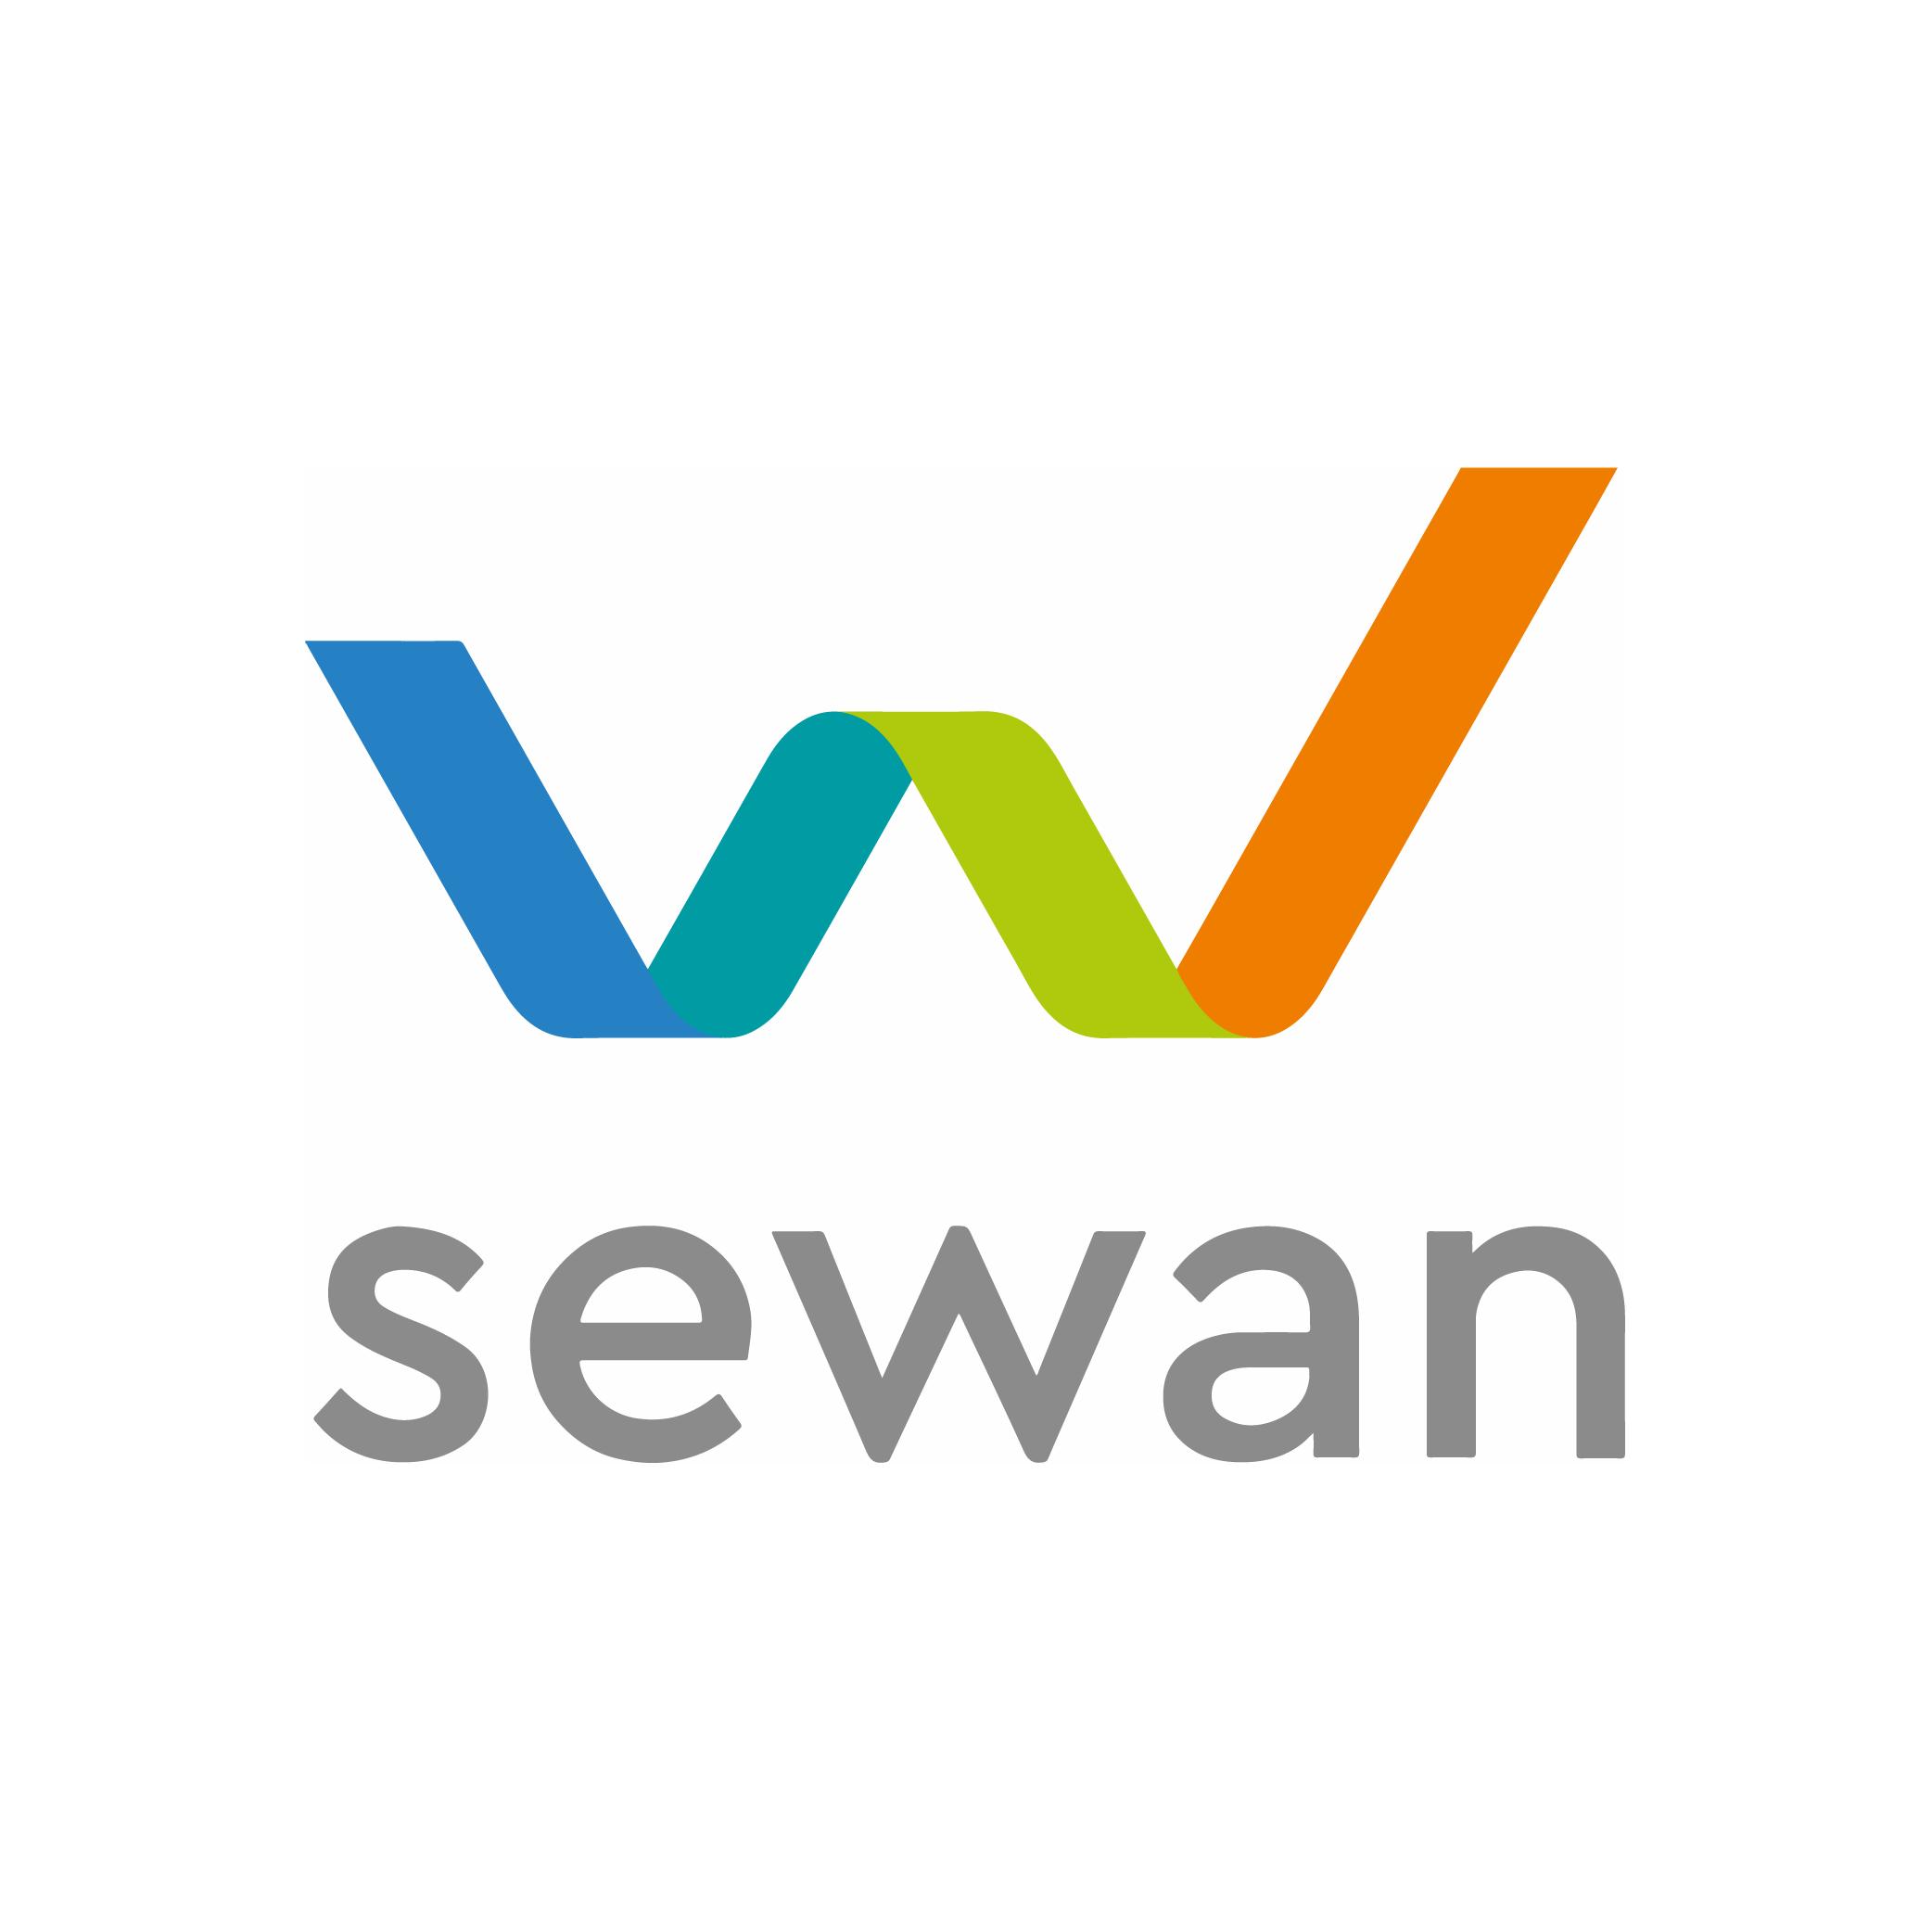 Sewan logo